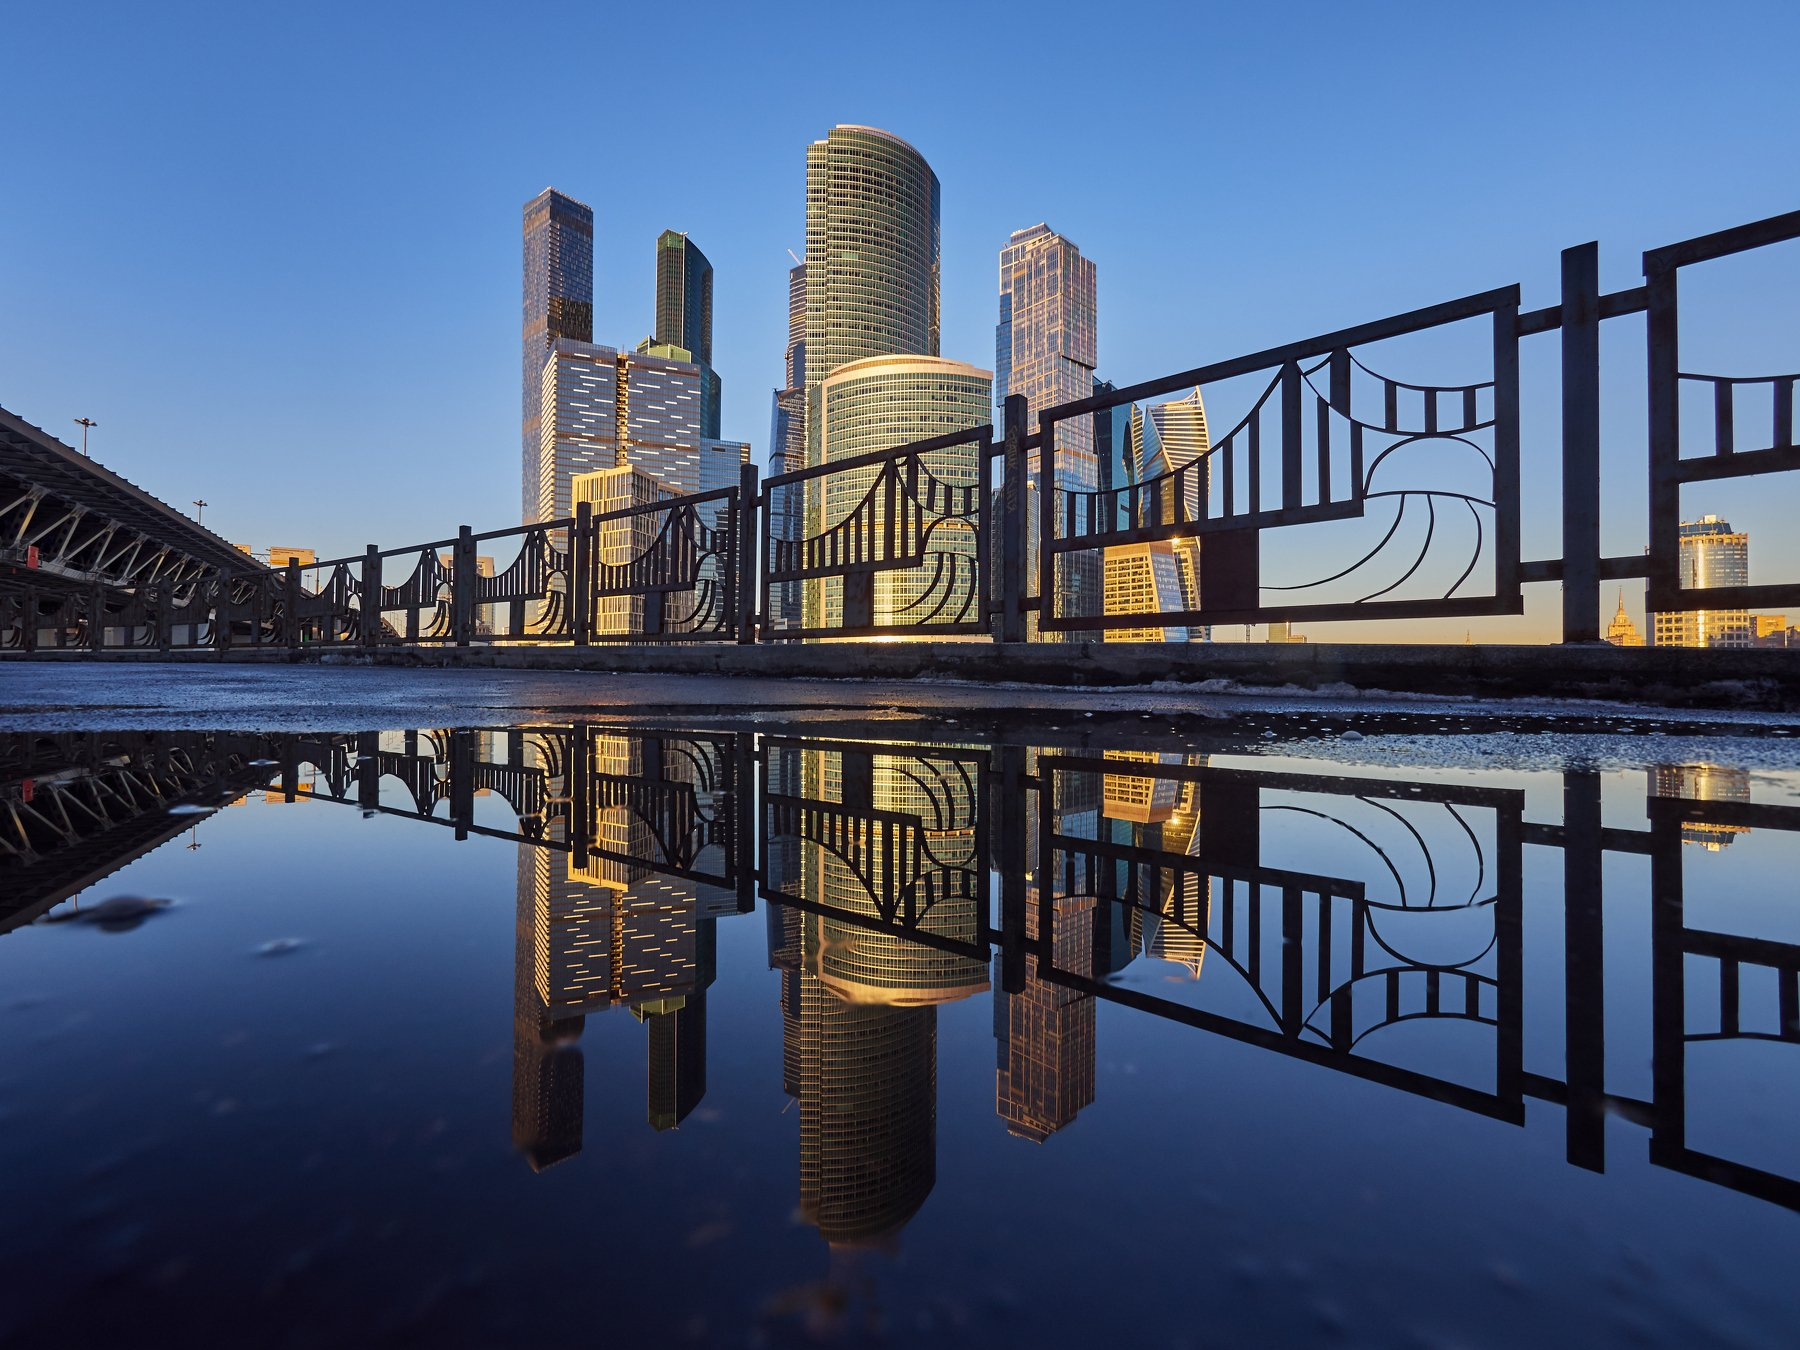 город, Москва, архитектура, небо, вода, отражение, мост, небоскреб, зима, прогулка, Конев Сергей